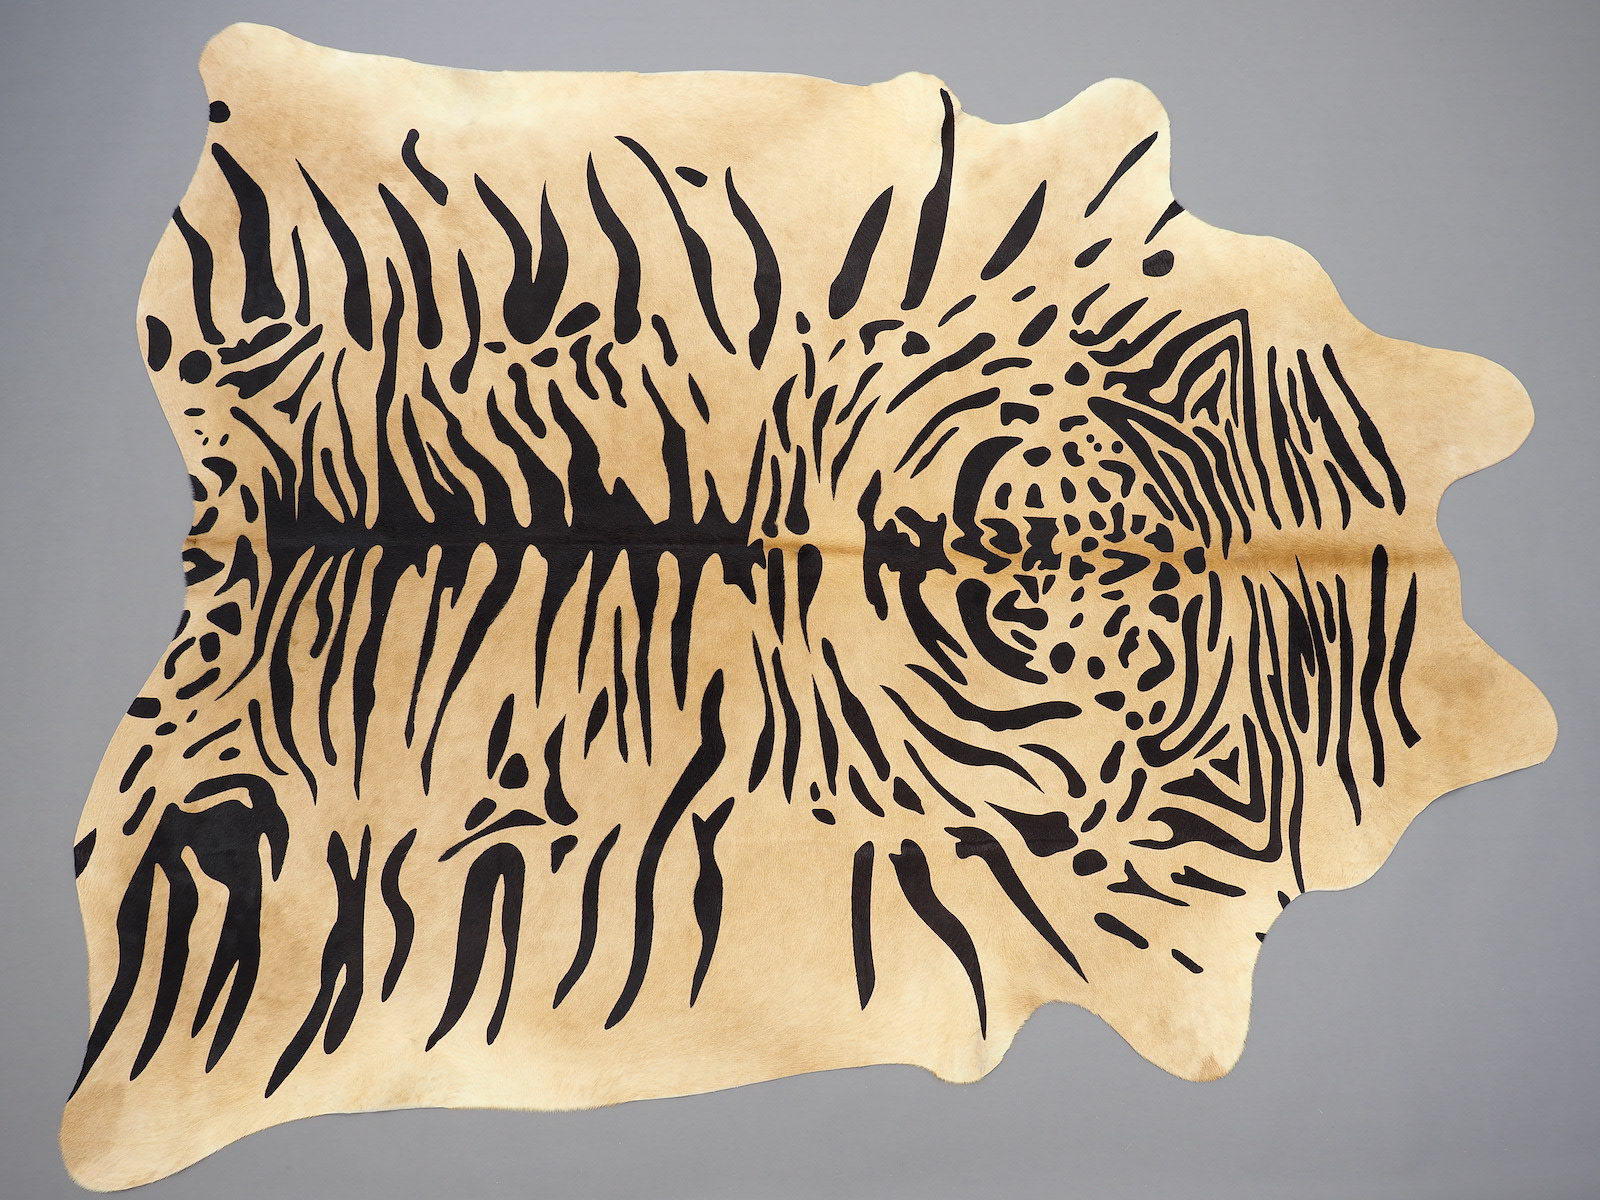 Шкура тигра — коровья шкура крашеная арт.: 25378